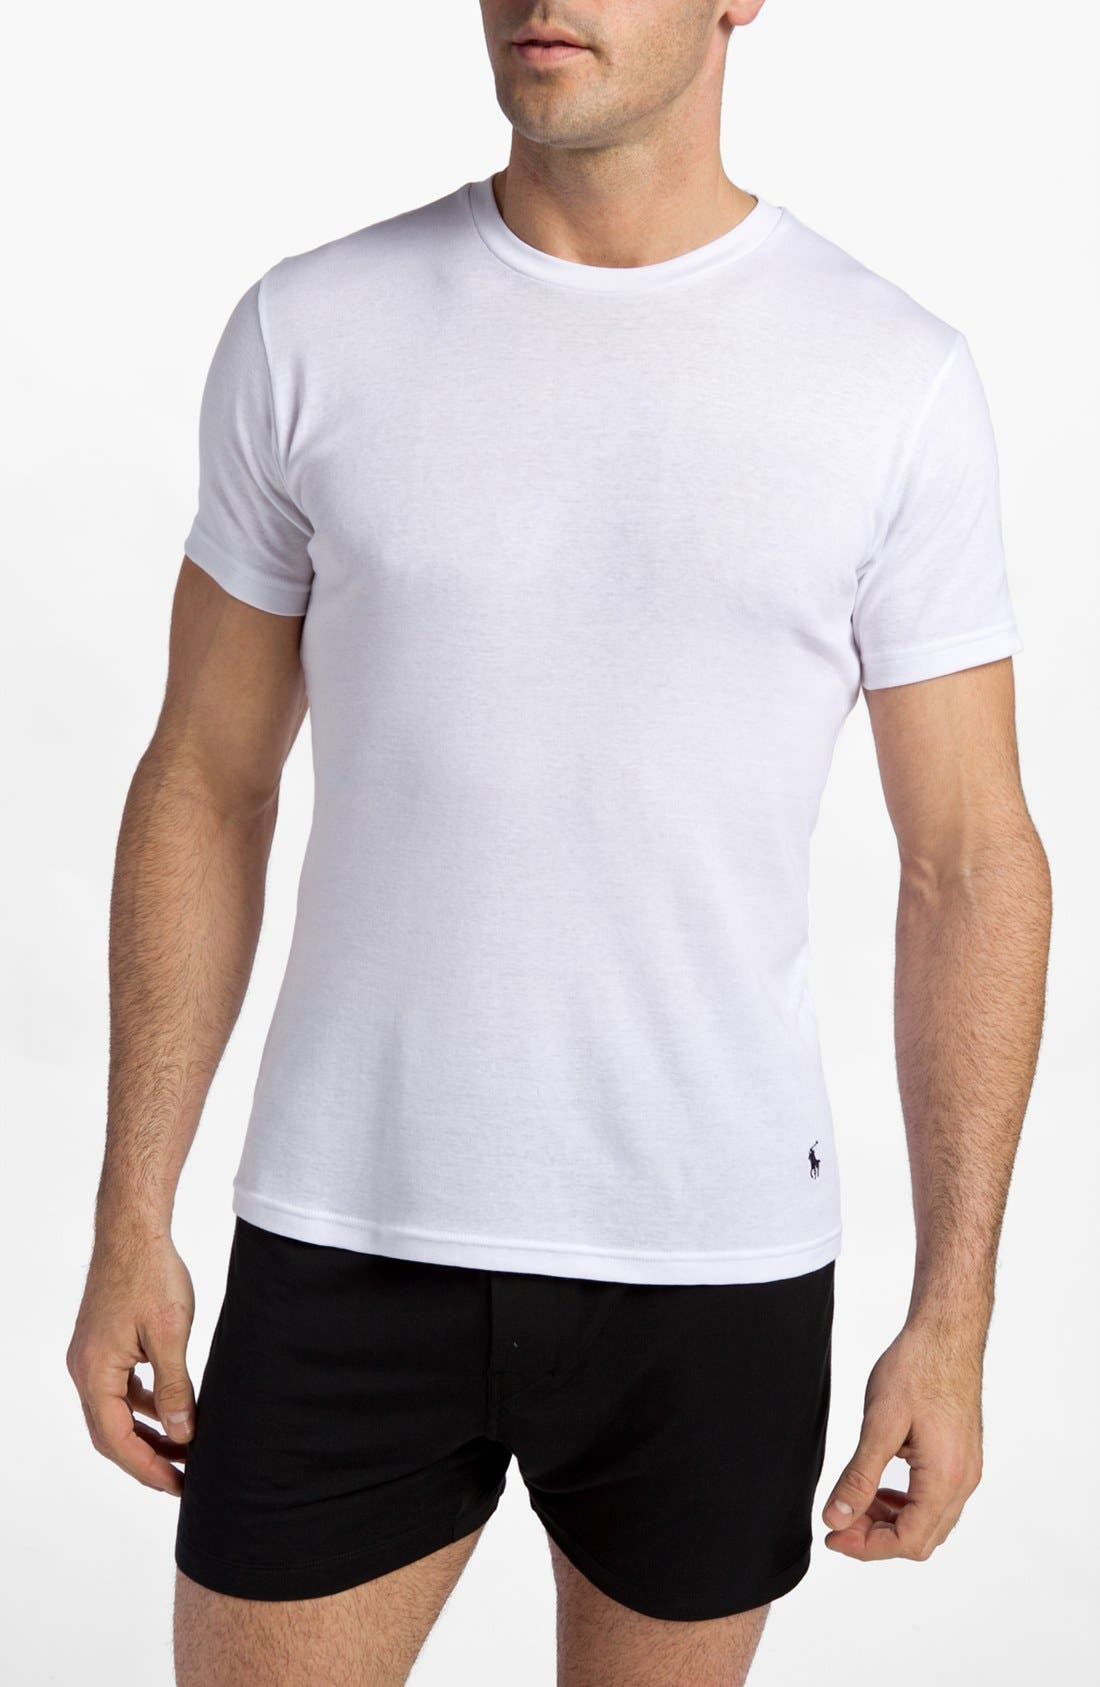 Alternate Image 1 Selected - Polo Ralph Lauren 2-Pack Cotton Crewneck T-Shirt (Big)